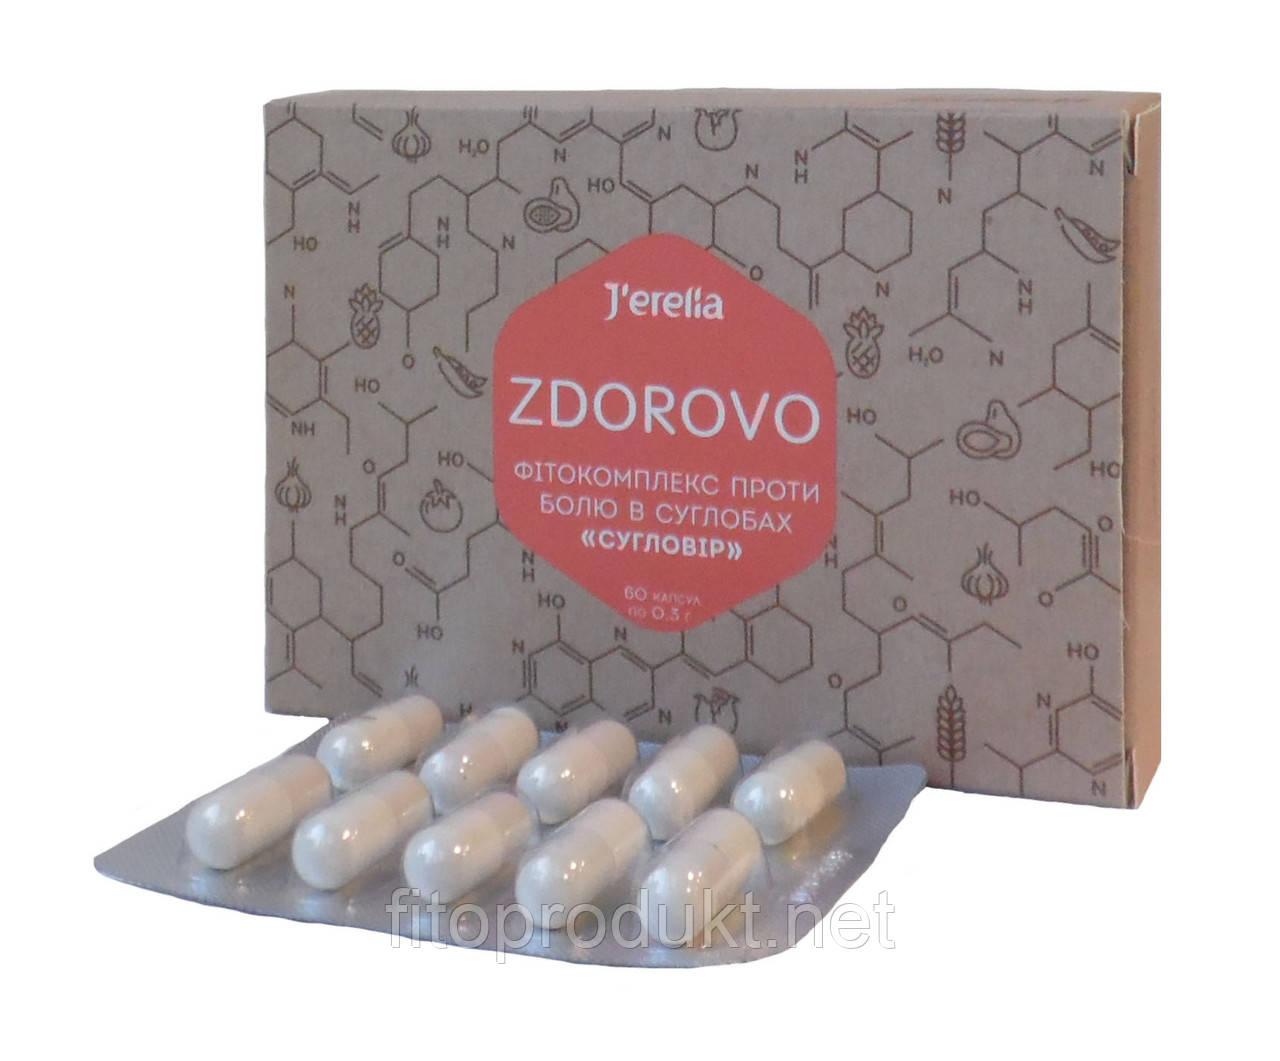 Сугловир фитокомплекс против боли в суставах 60 капсул ZDOROVO СНЯТ с производства